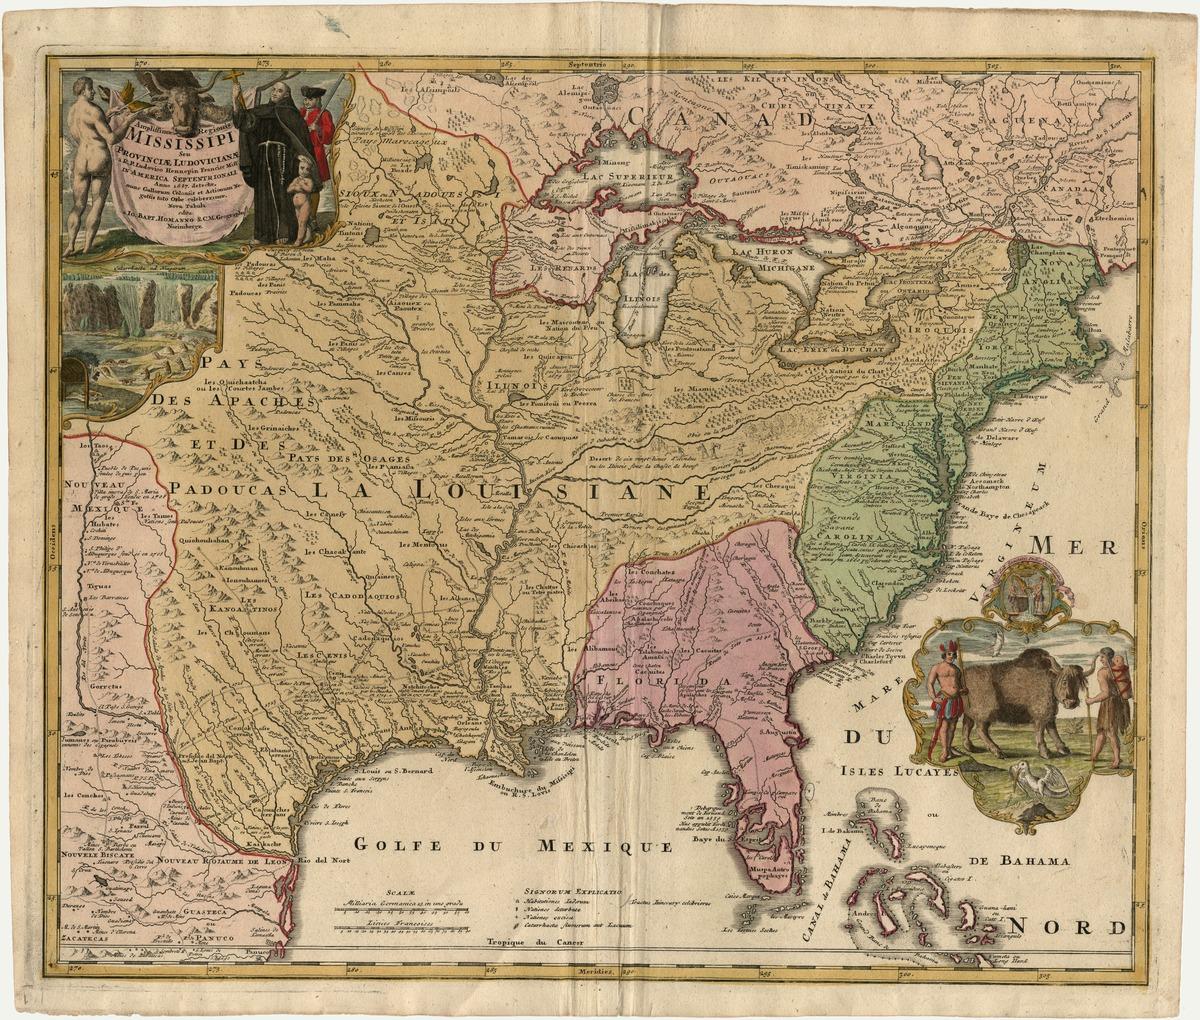 Amplissimae regionis Mississippi, seu provinciae Ludovicianæ à R.P. Ludovico Hennepin Francisc miss. In America Septentrionali, anno 1687 . . . .